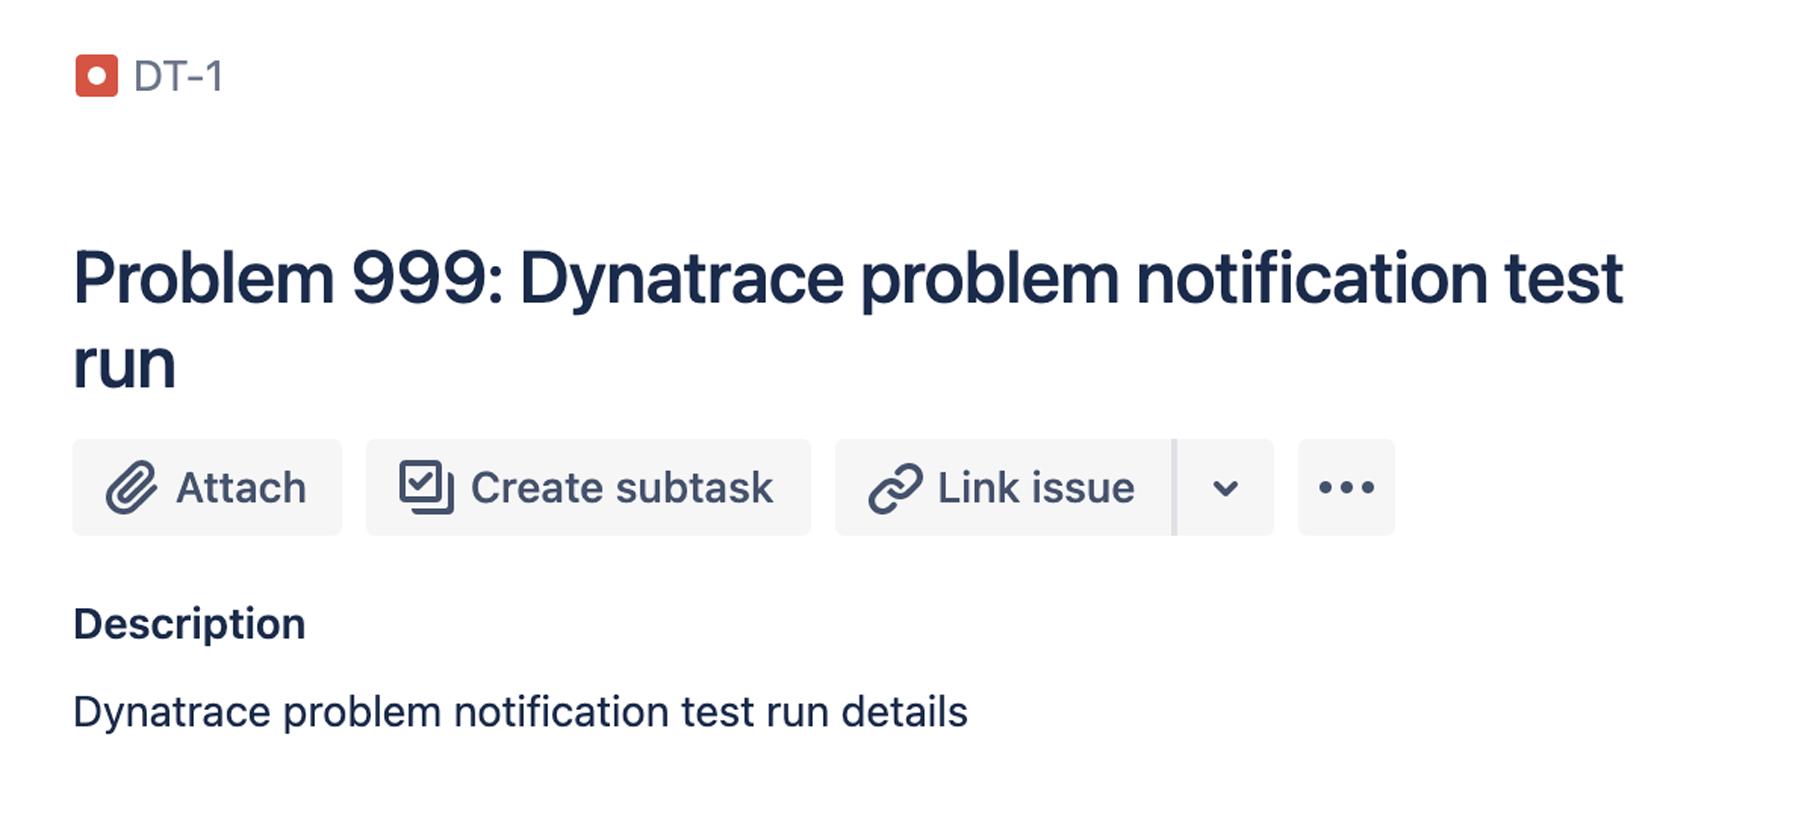 Dynatrace problem notification test run